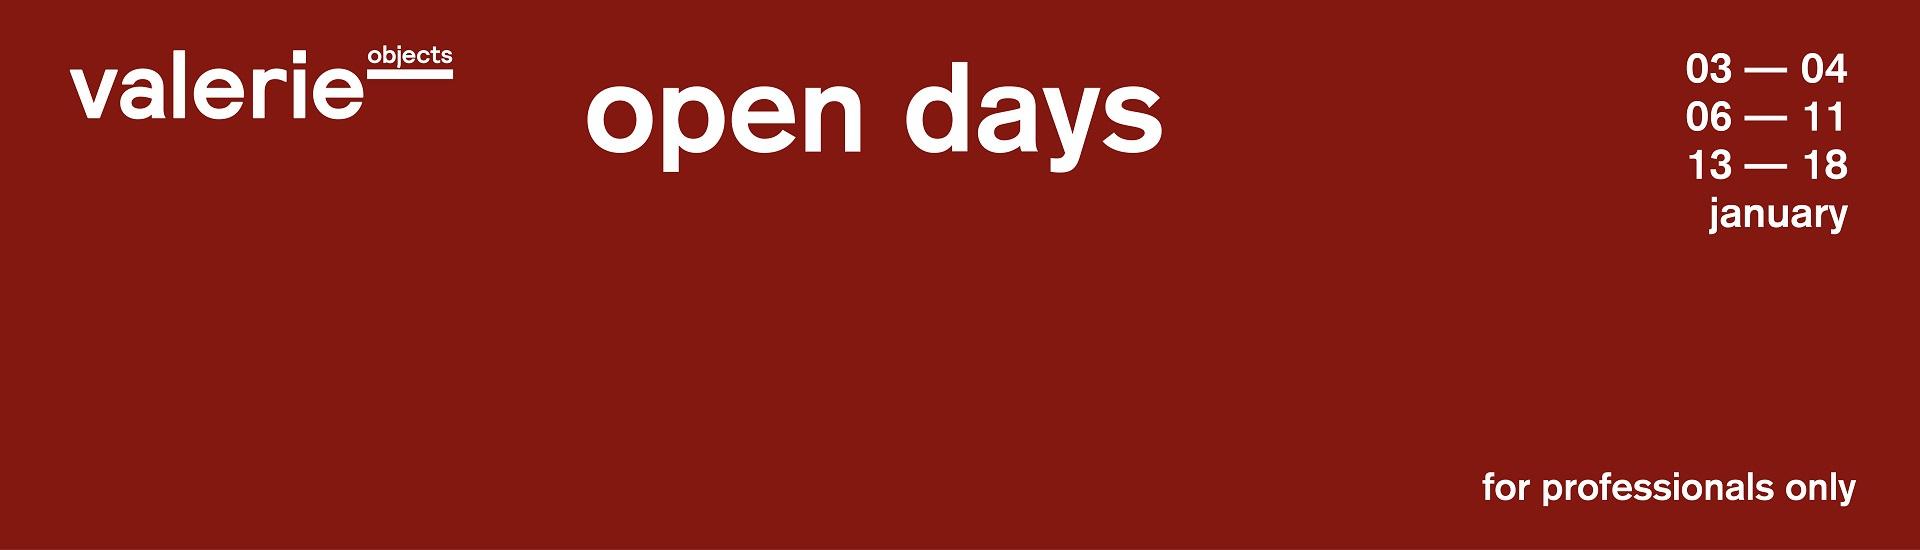 Open Days 19